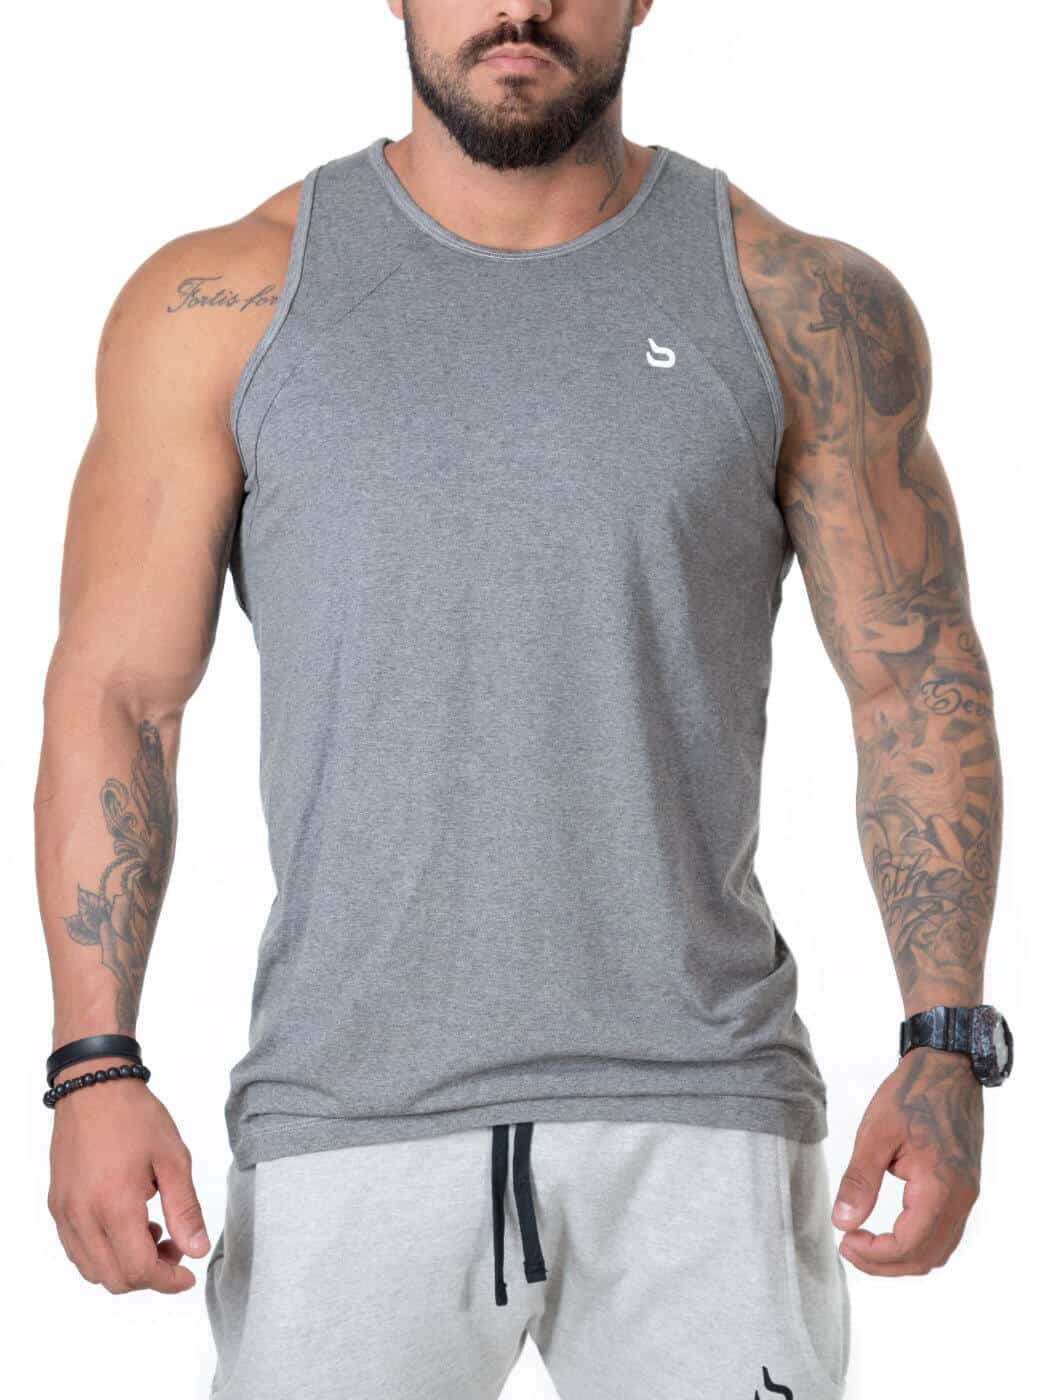 640535ebc13a1 Regatas Masculinas Fitness - barbell Brasil